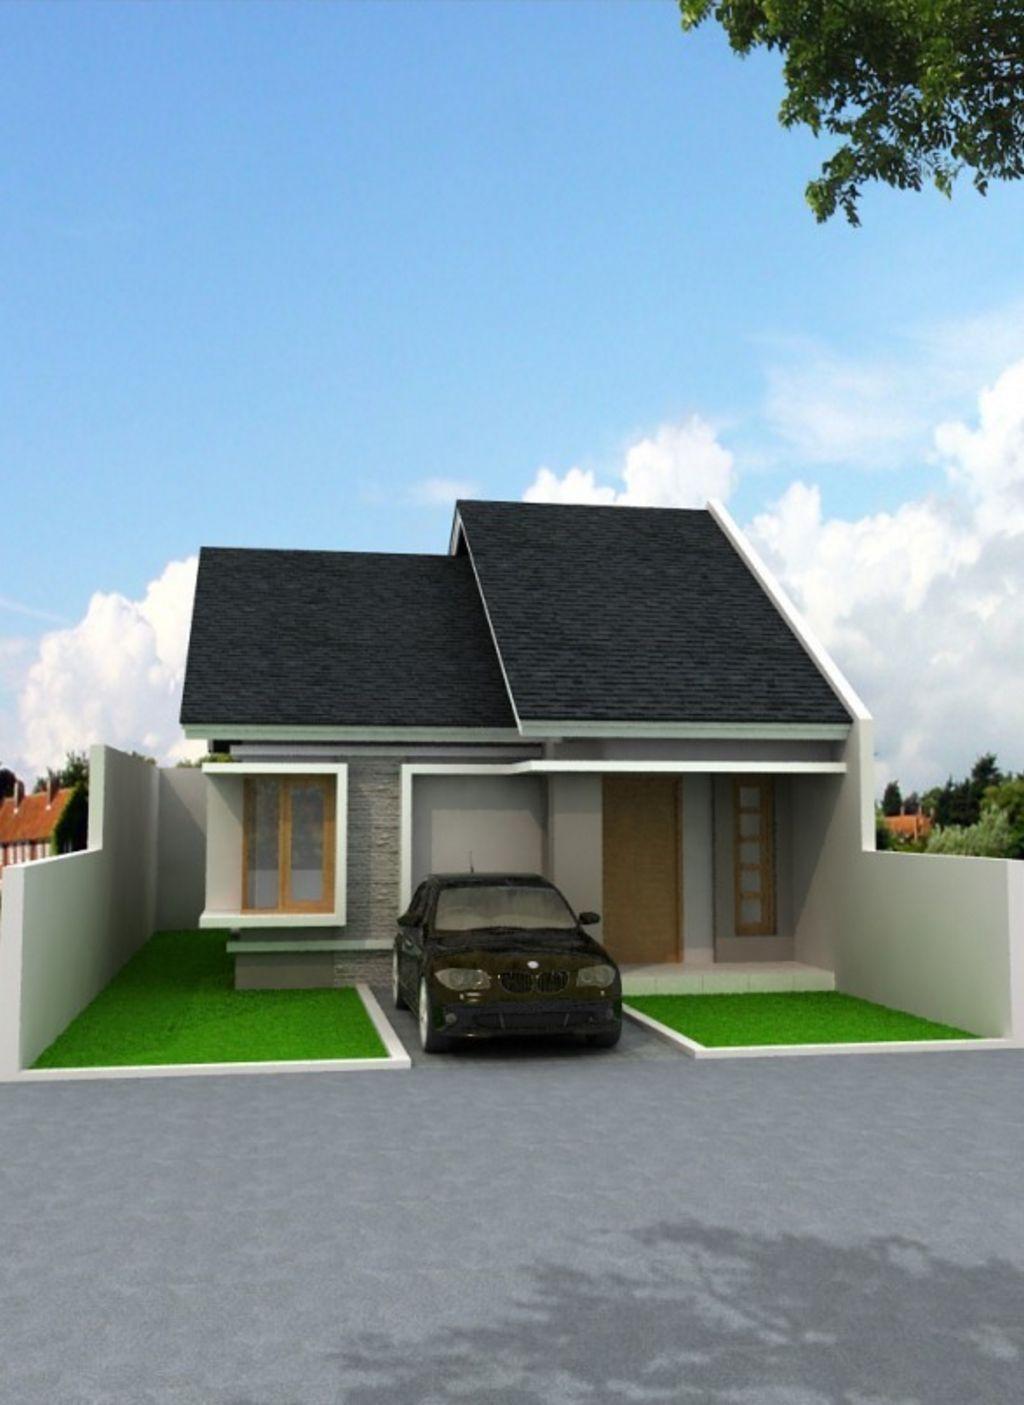 gambar sketsa rumah kecil yang menarik